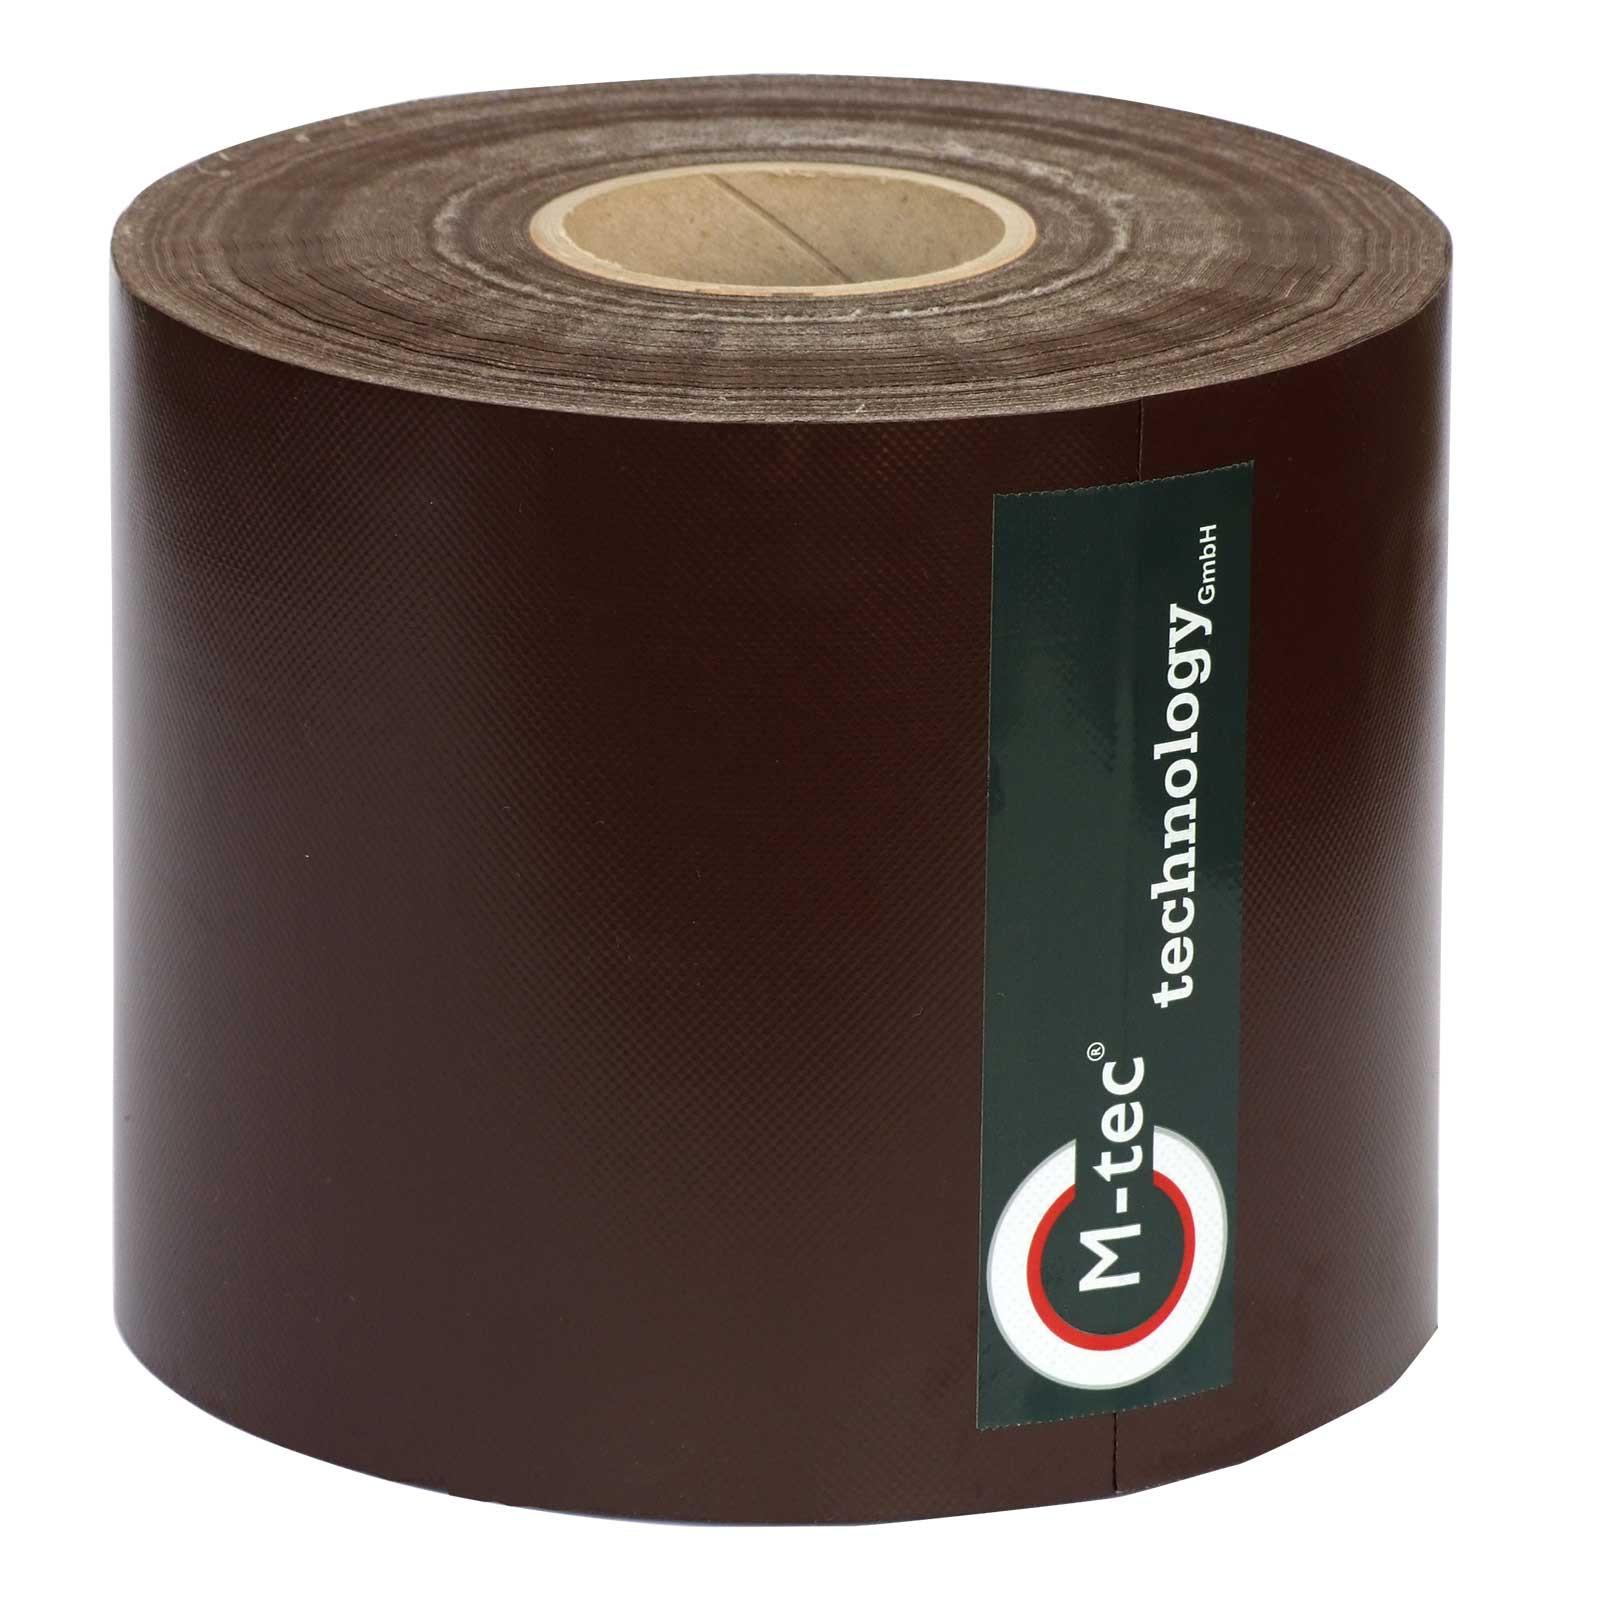 M-tec Profi-line ® braun PVC Sichtschutzrolle L=65m, H=19cm